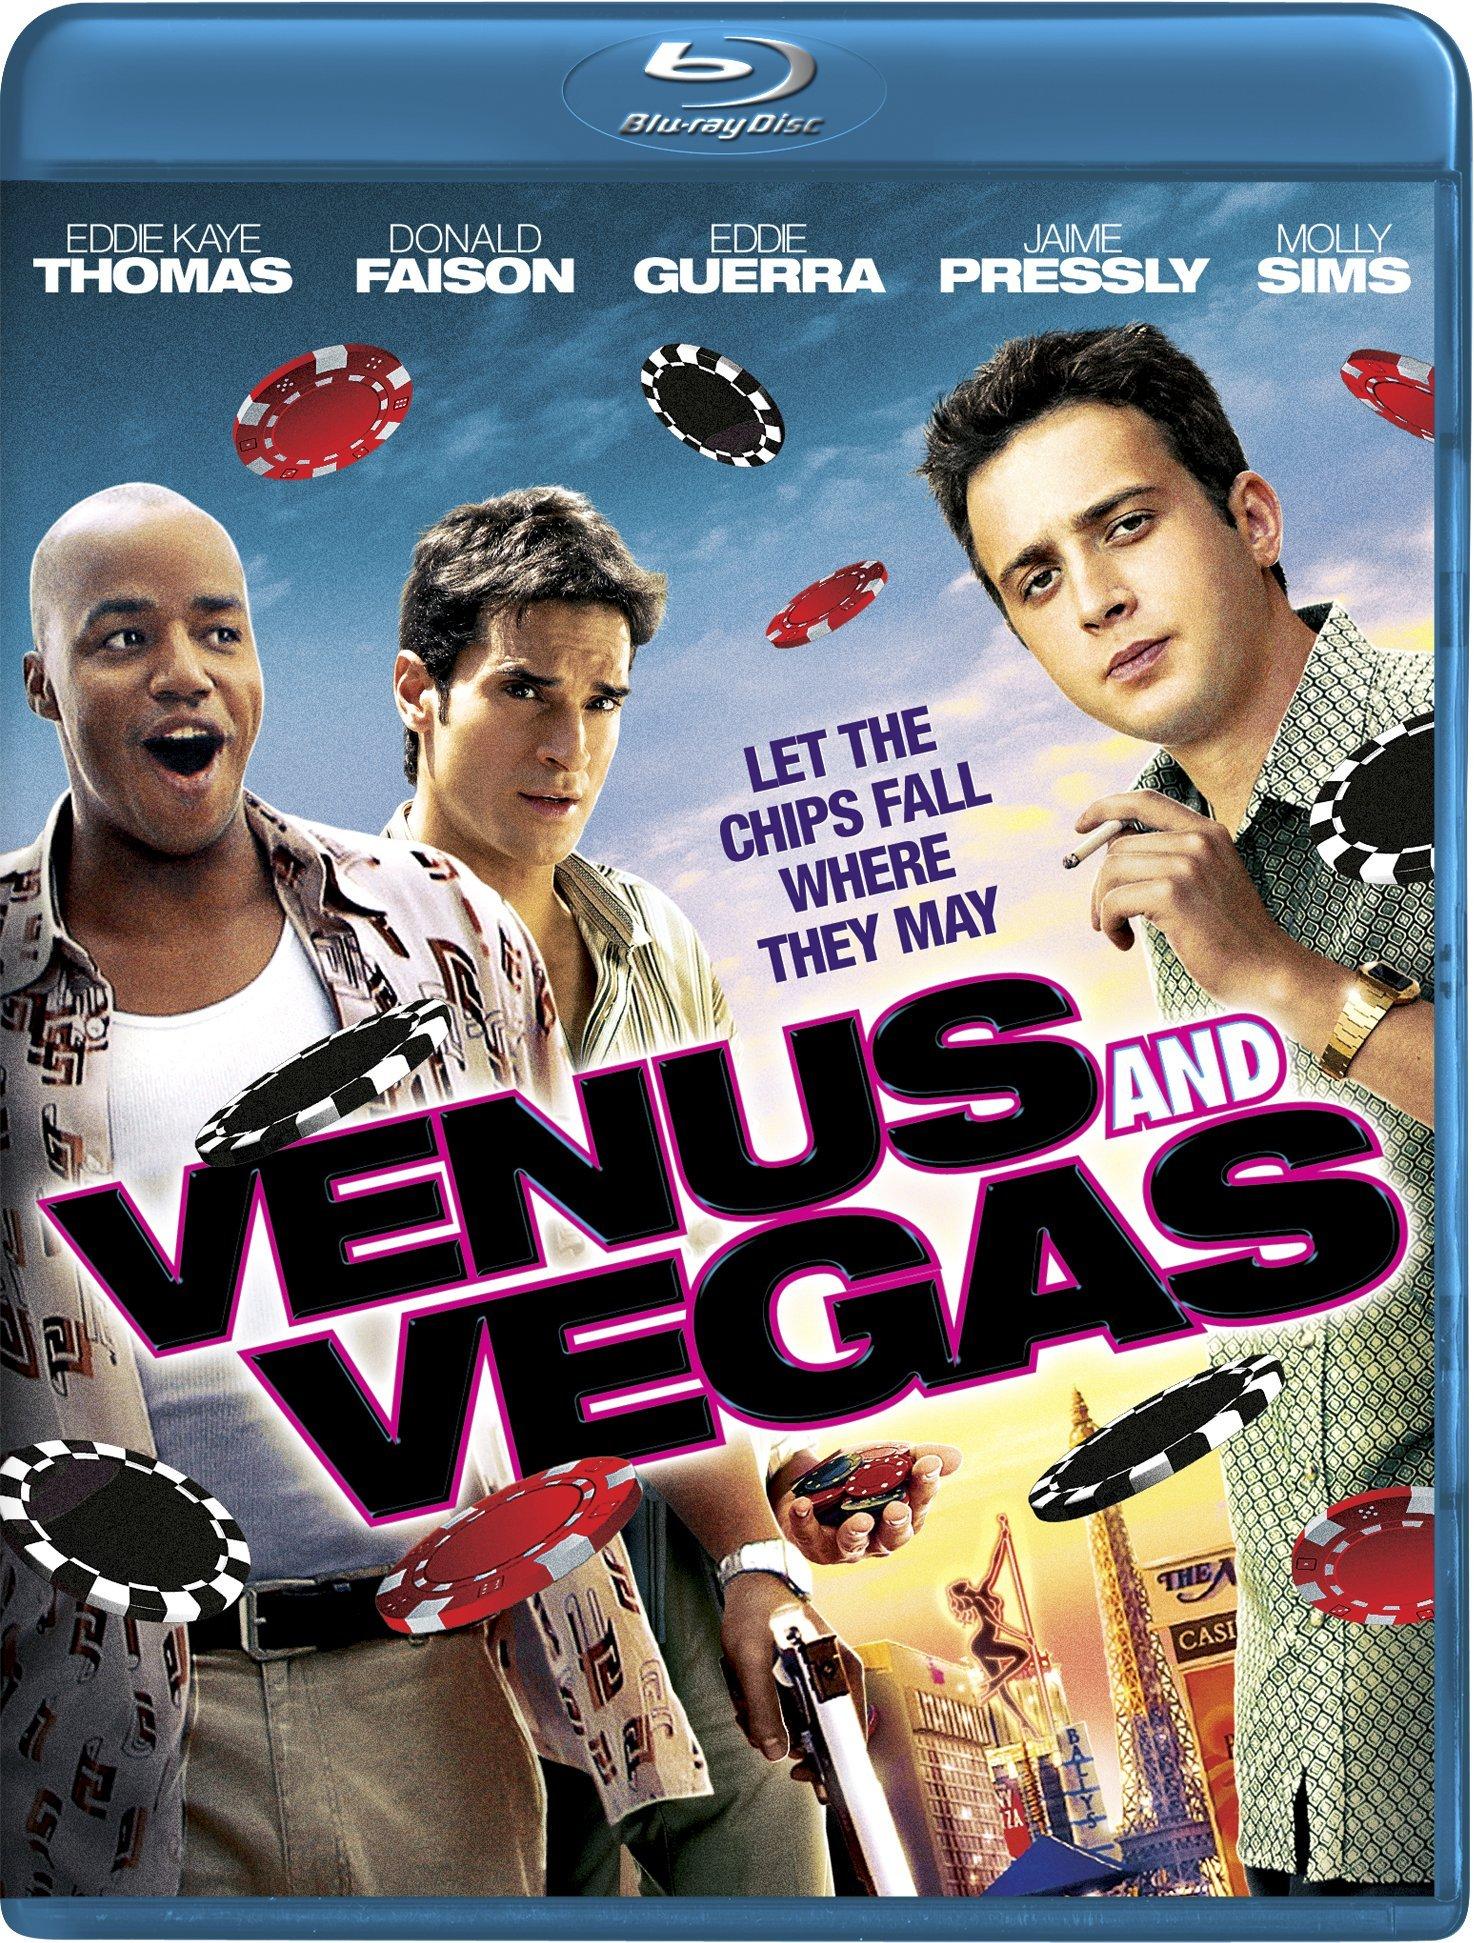 Blu-ray : Venus & Vegas (Blu-ray)